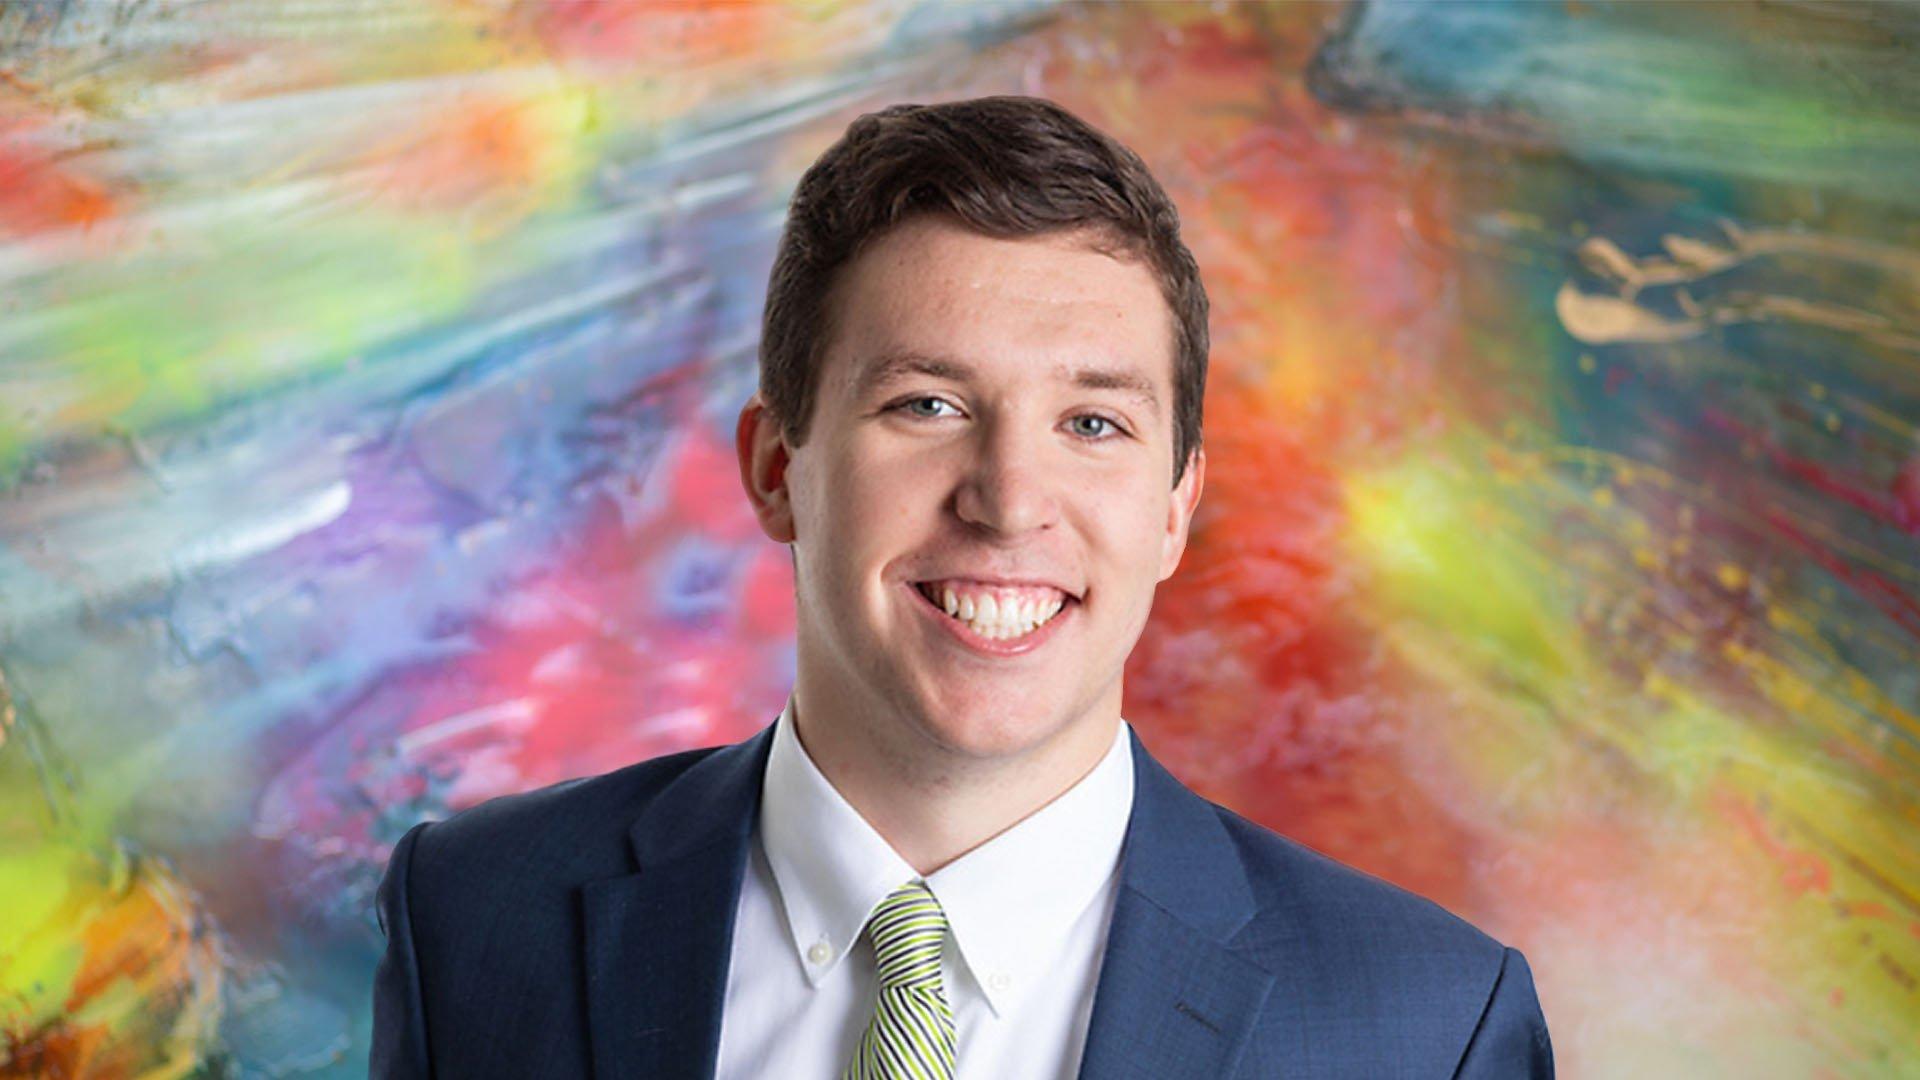 Image of Thomas Conroy, Senior Account Executive at Peregrine Communications